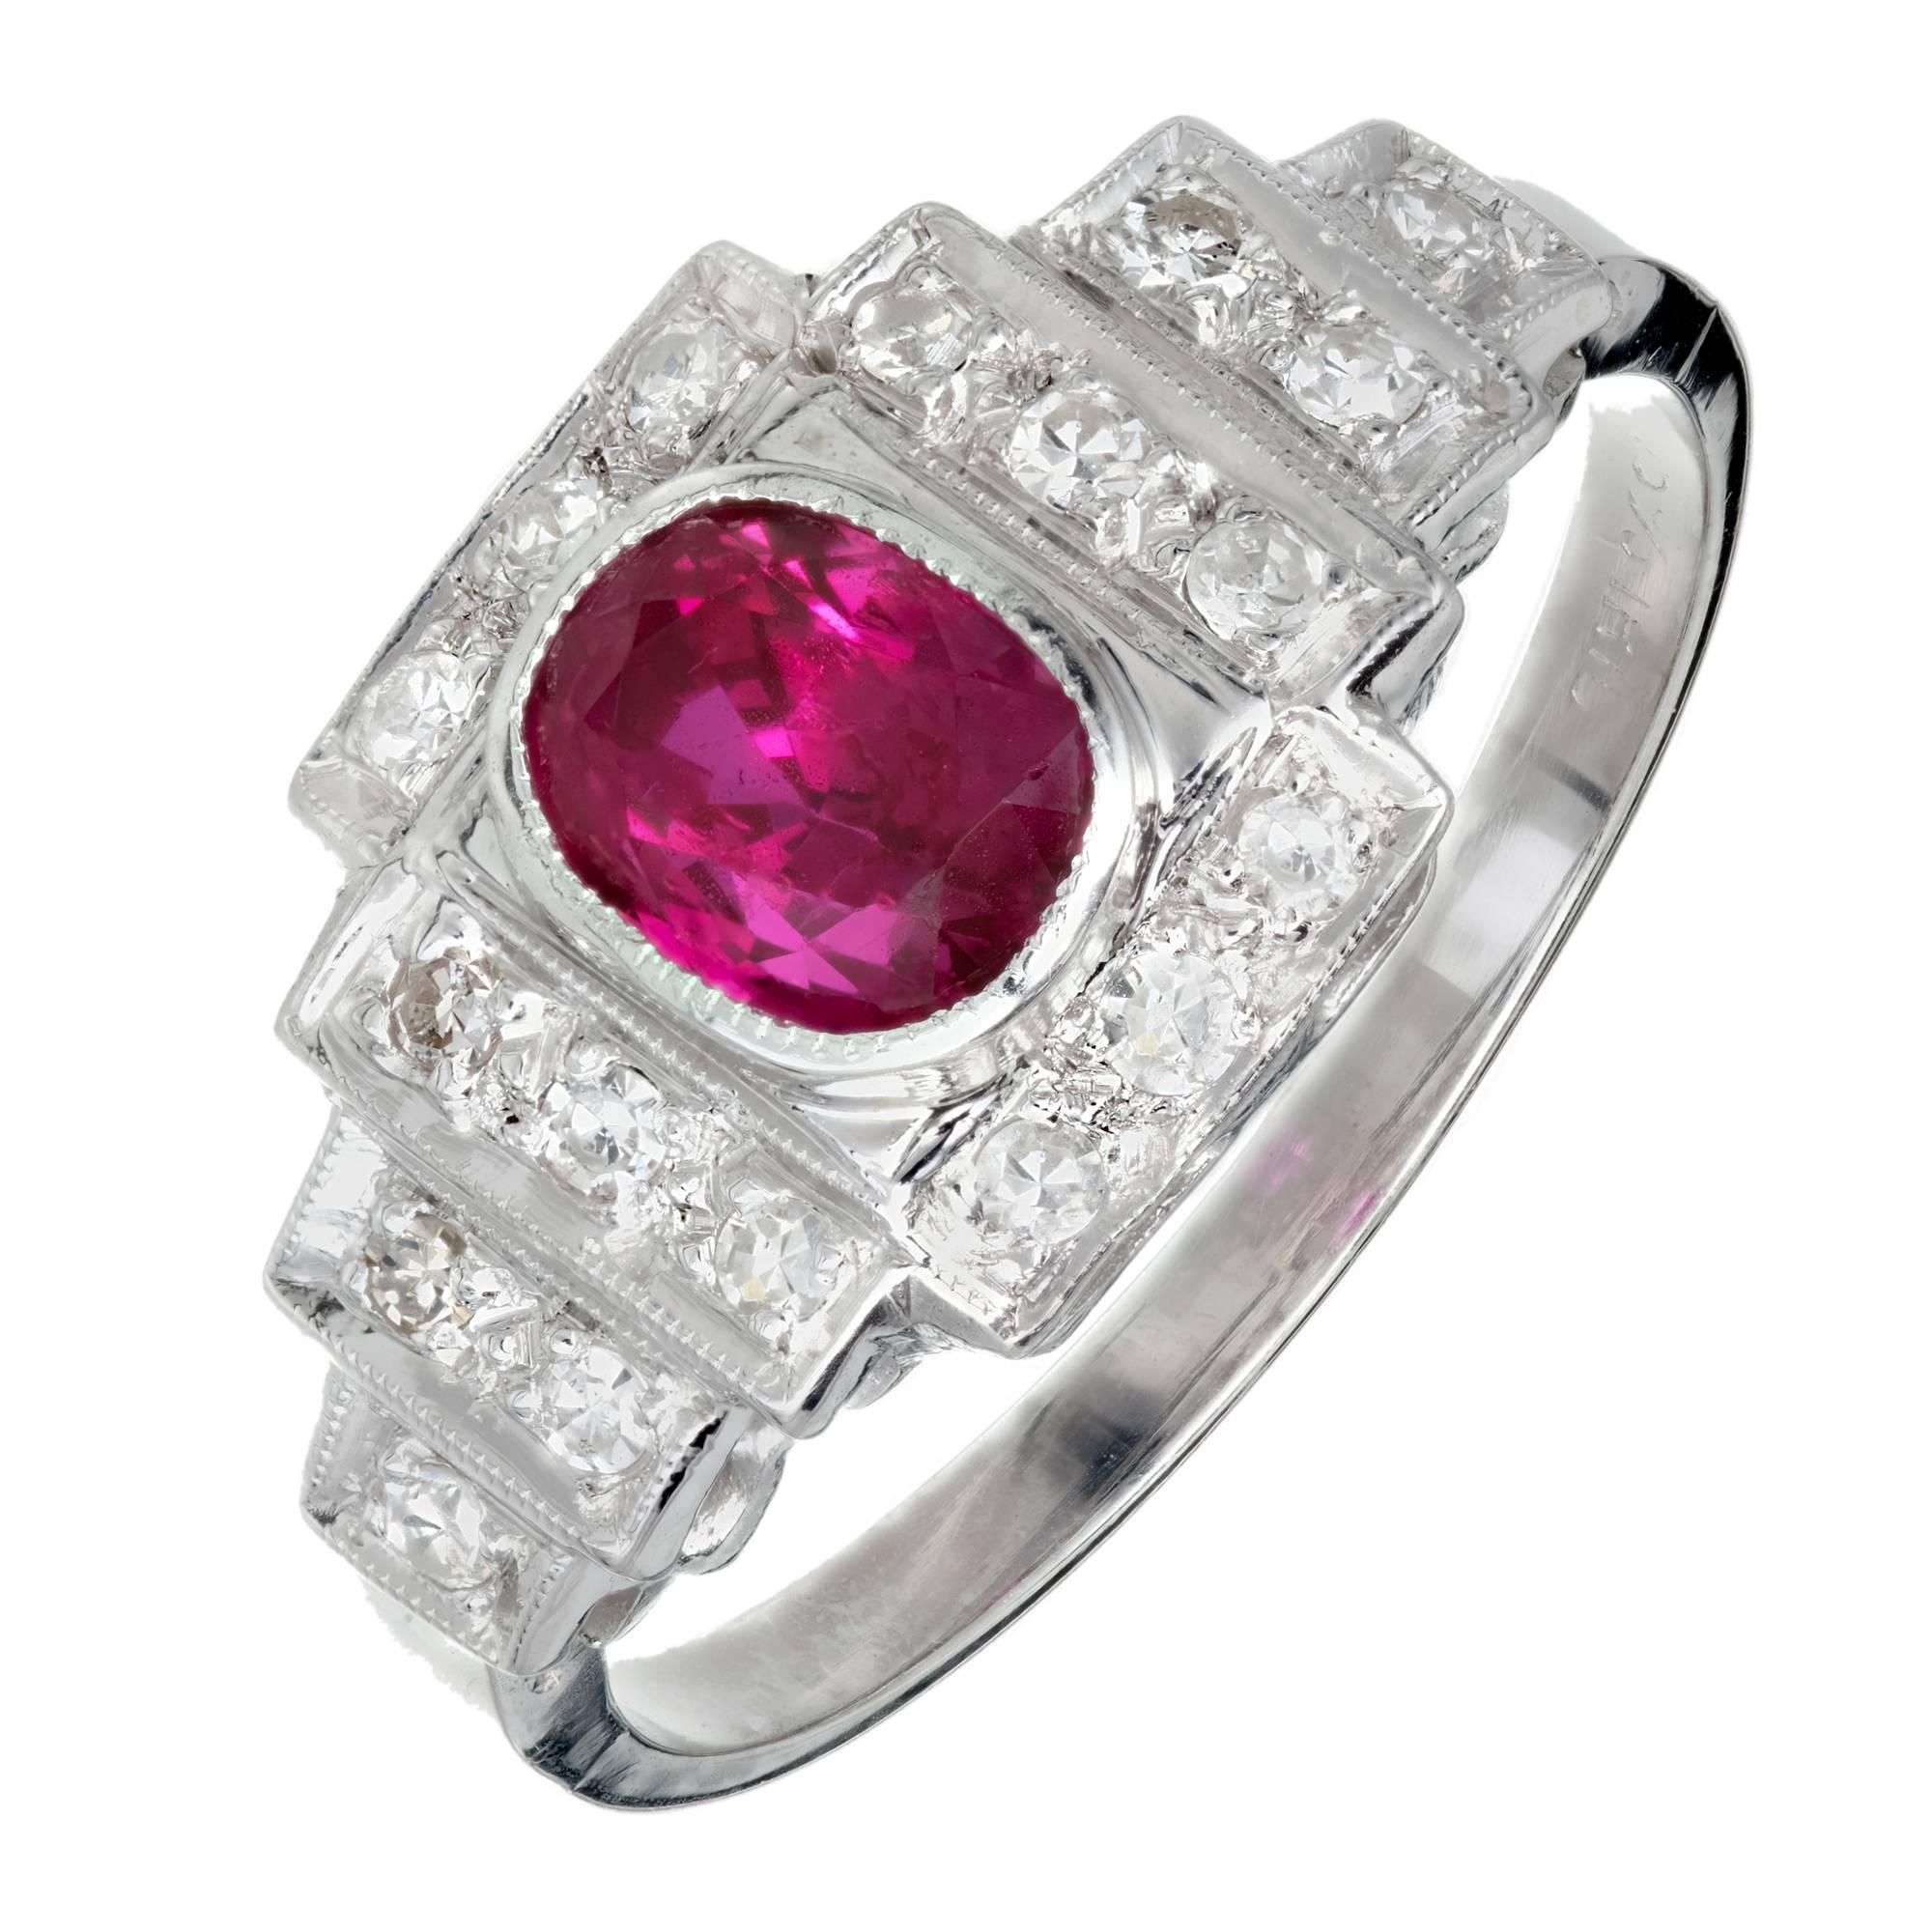 Art Deco GIA Certified 1.04 Carat Natural Ruby Diamond Platinum Engagement Ring